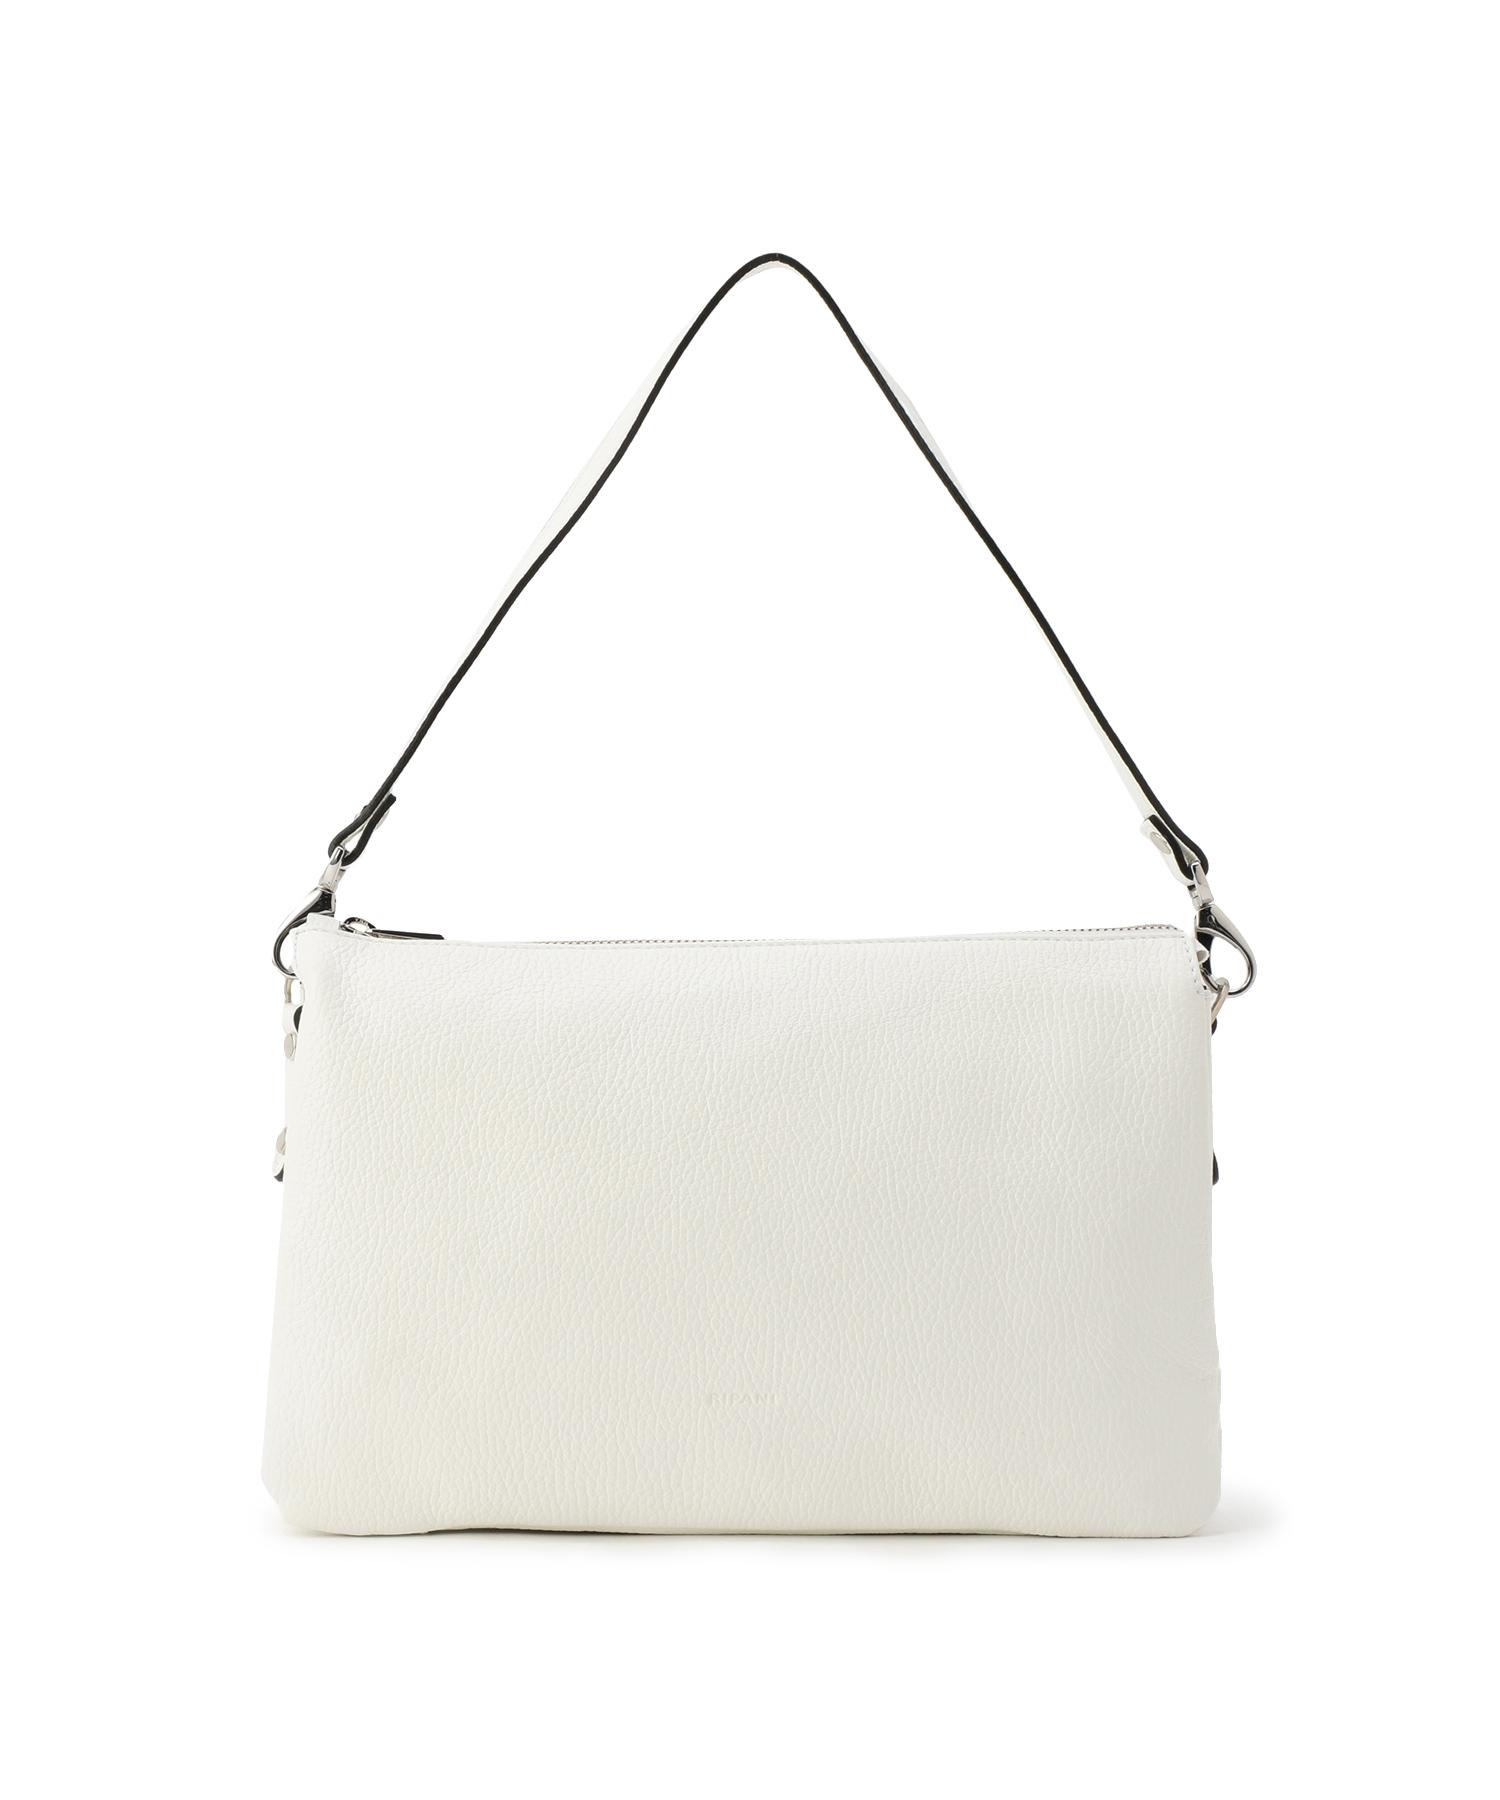 RIPANI / ストラップ付きバッグ